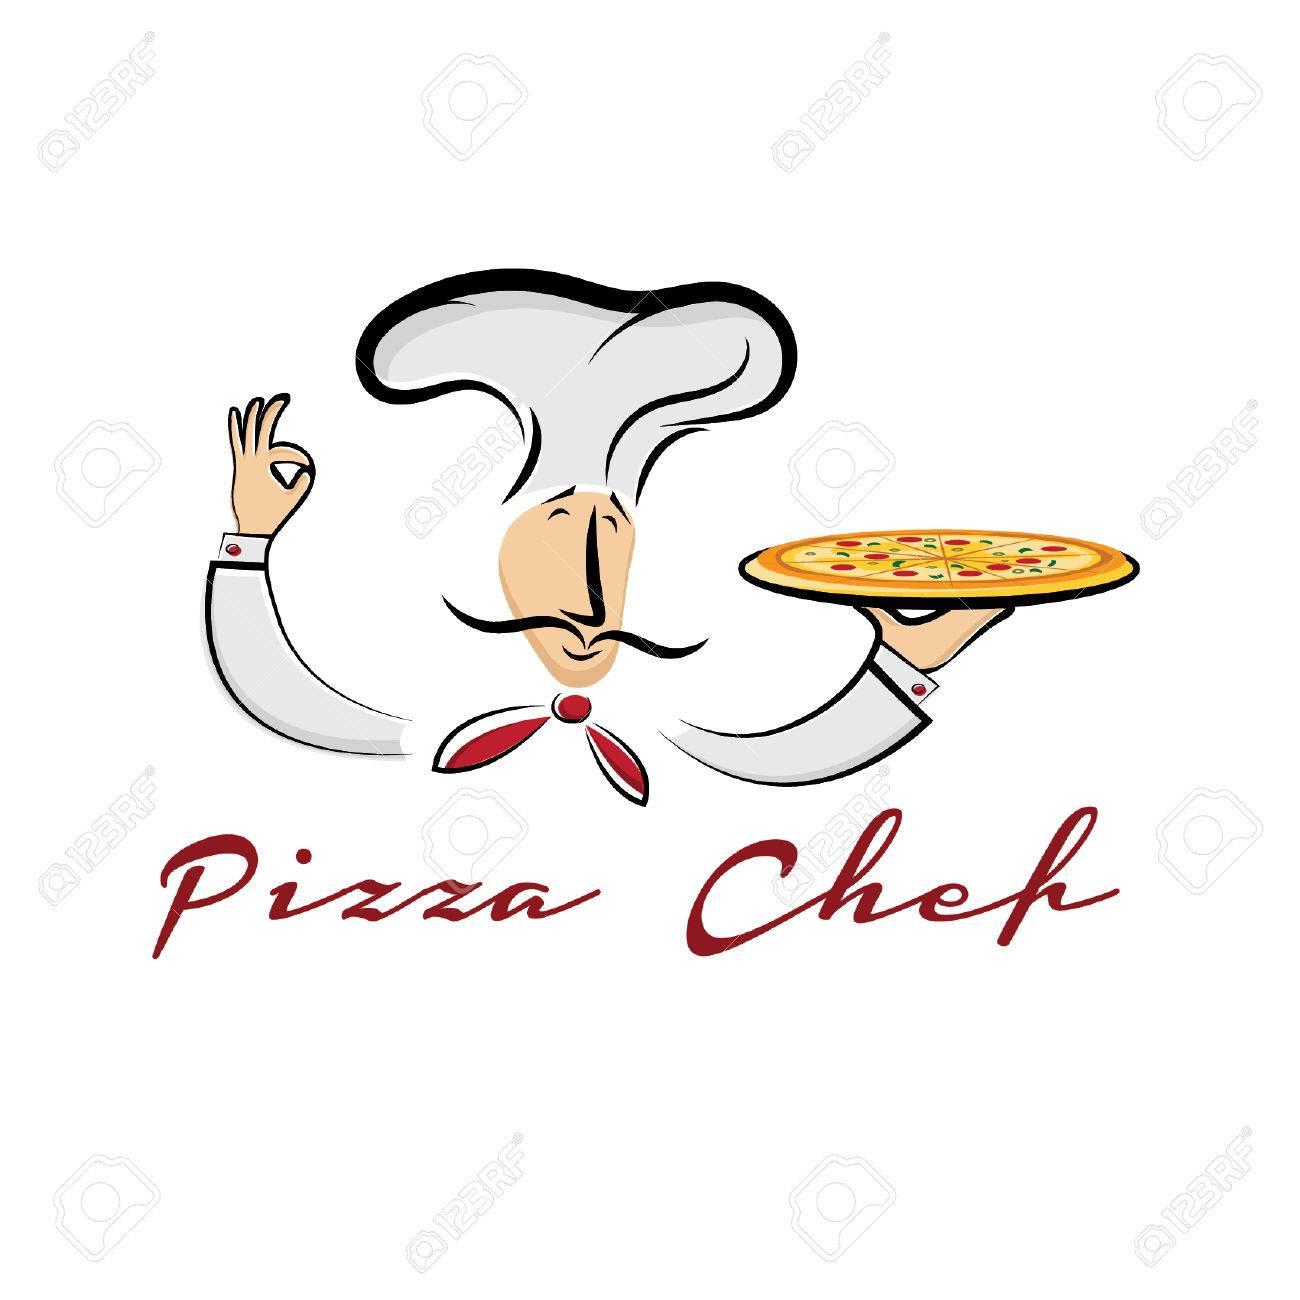 pizza chef cartoon illustration - 31845138